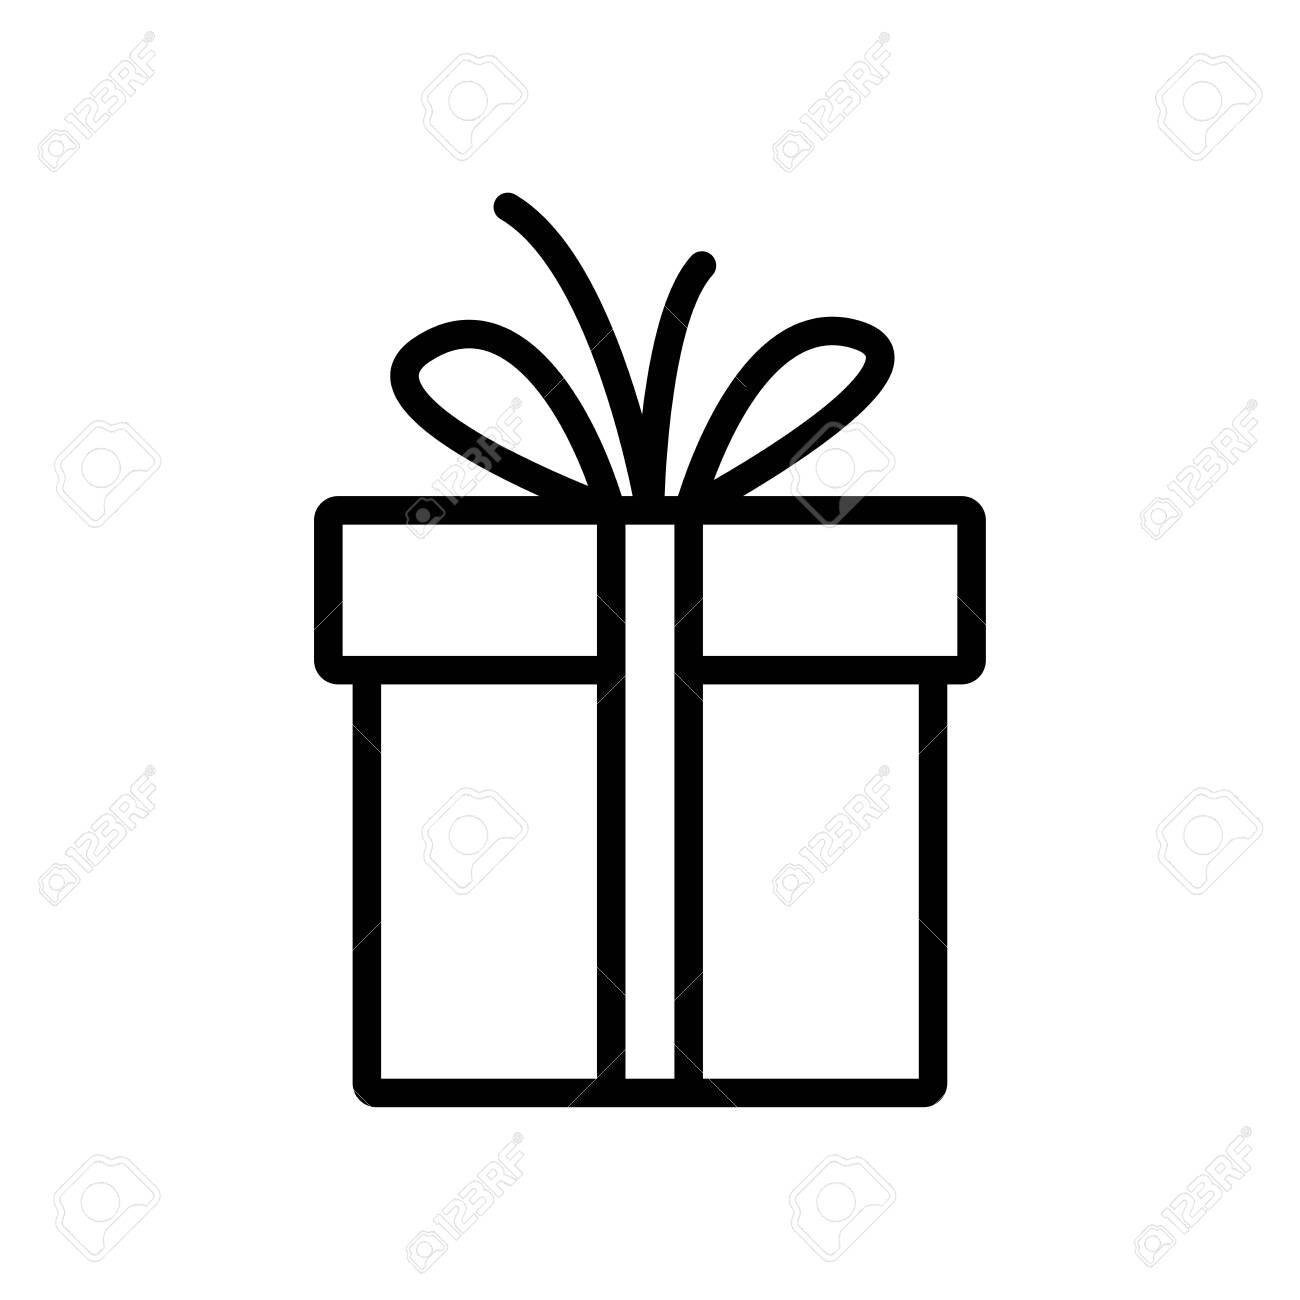 Gift box line icon - 150091827